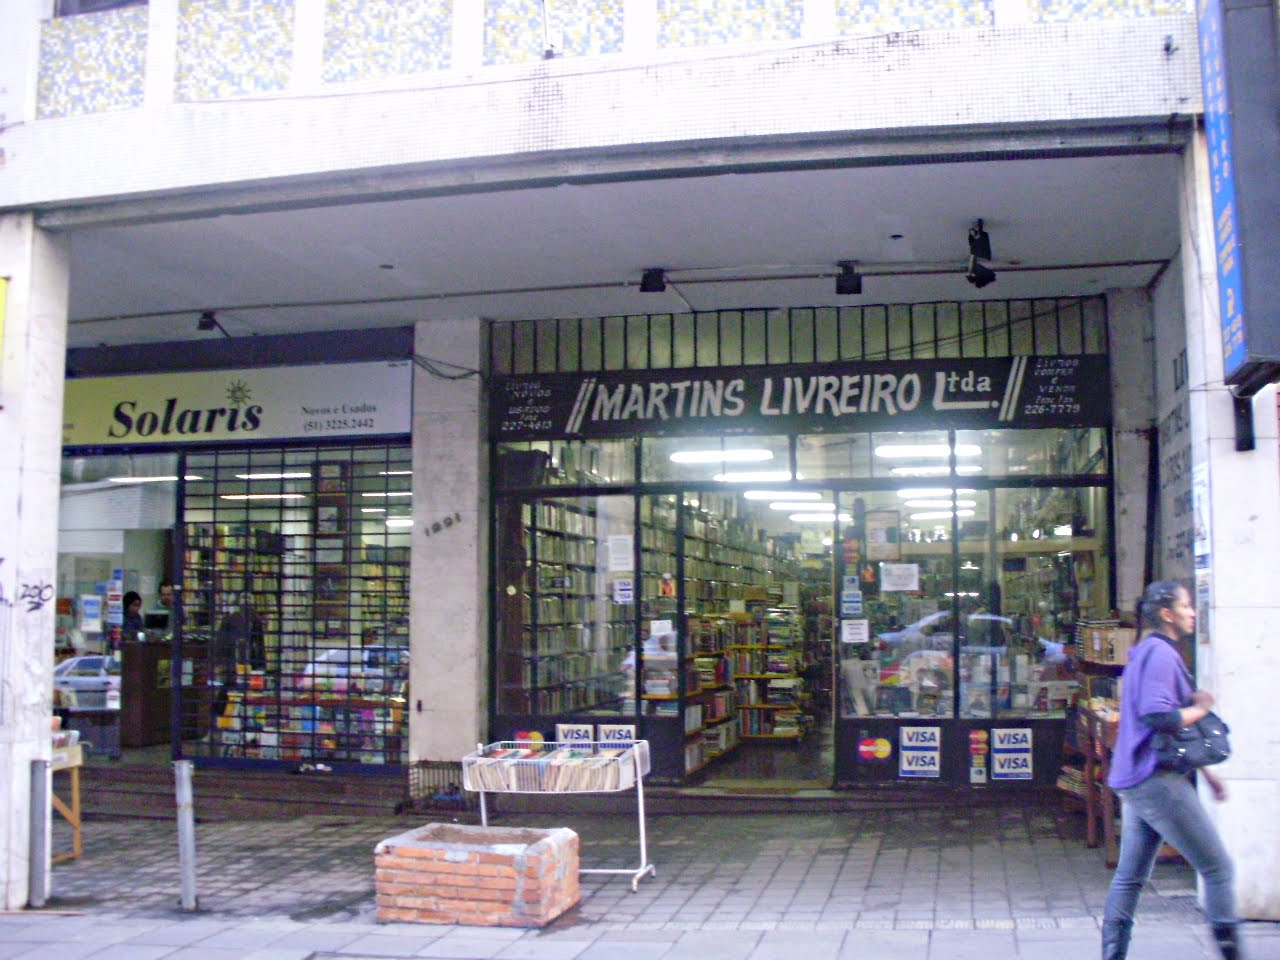 Global paths: Sebos temáticos de Porto Alegre